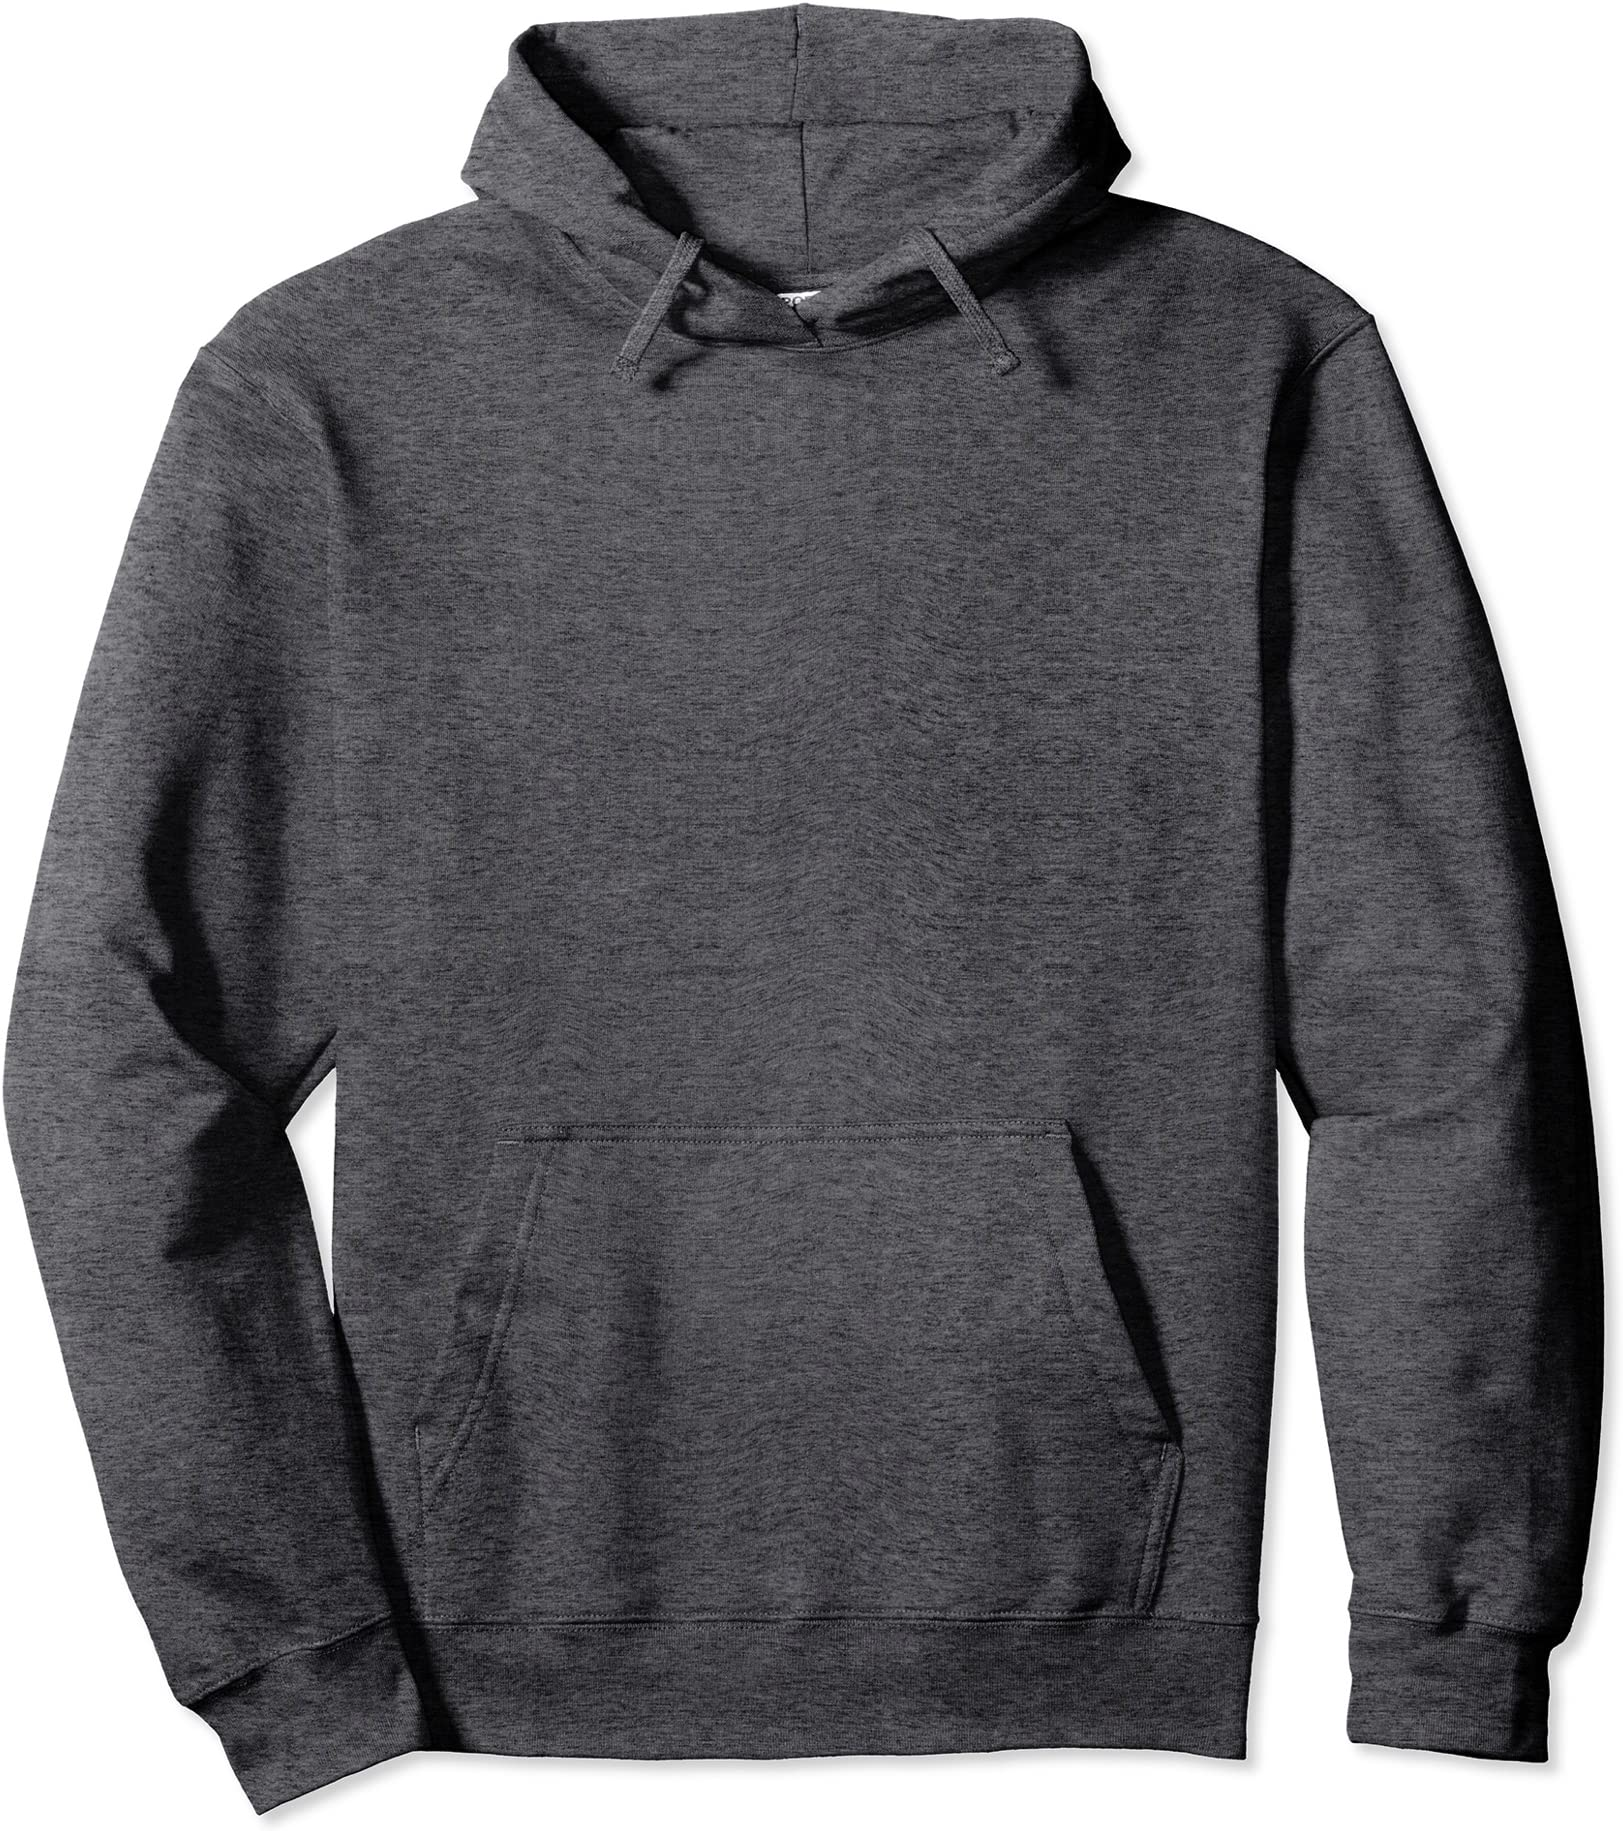 Football Expert Black Sweatshirt